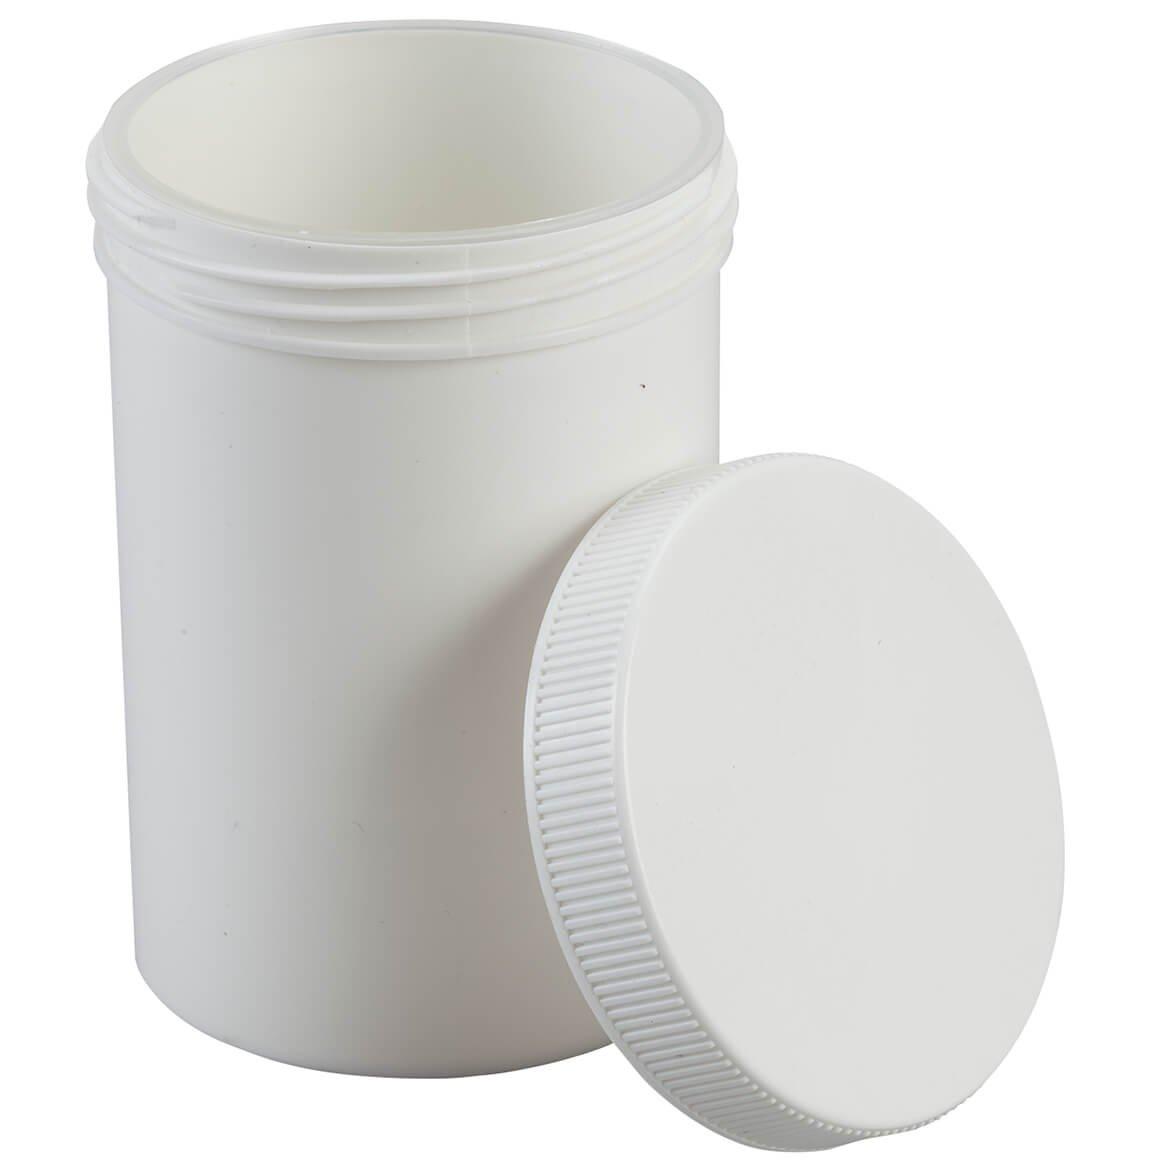 Hearing Aid Drying Jar